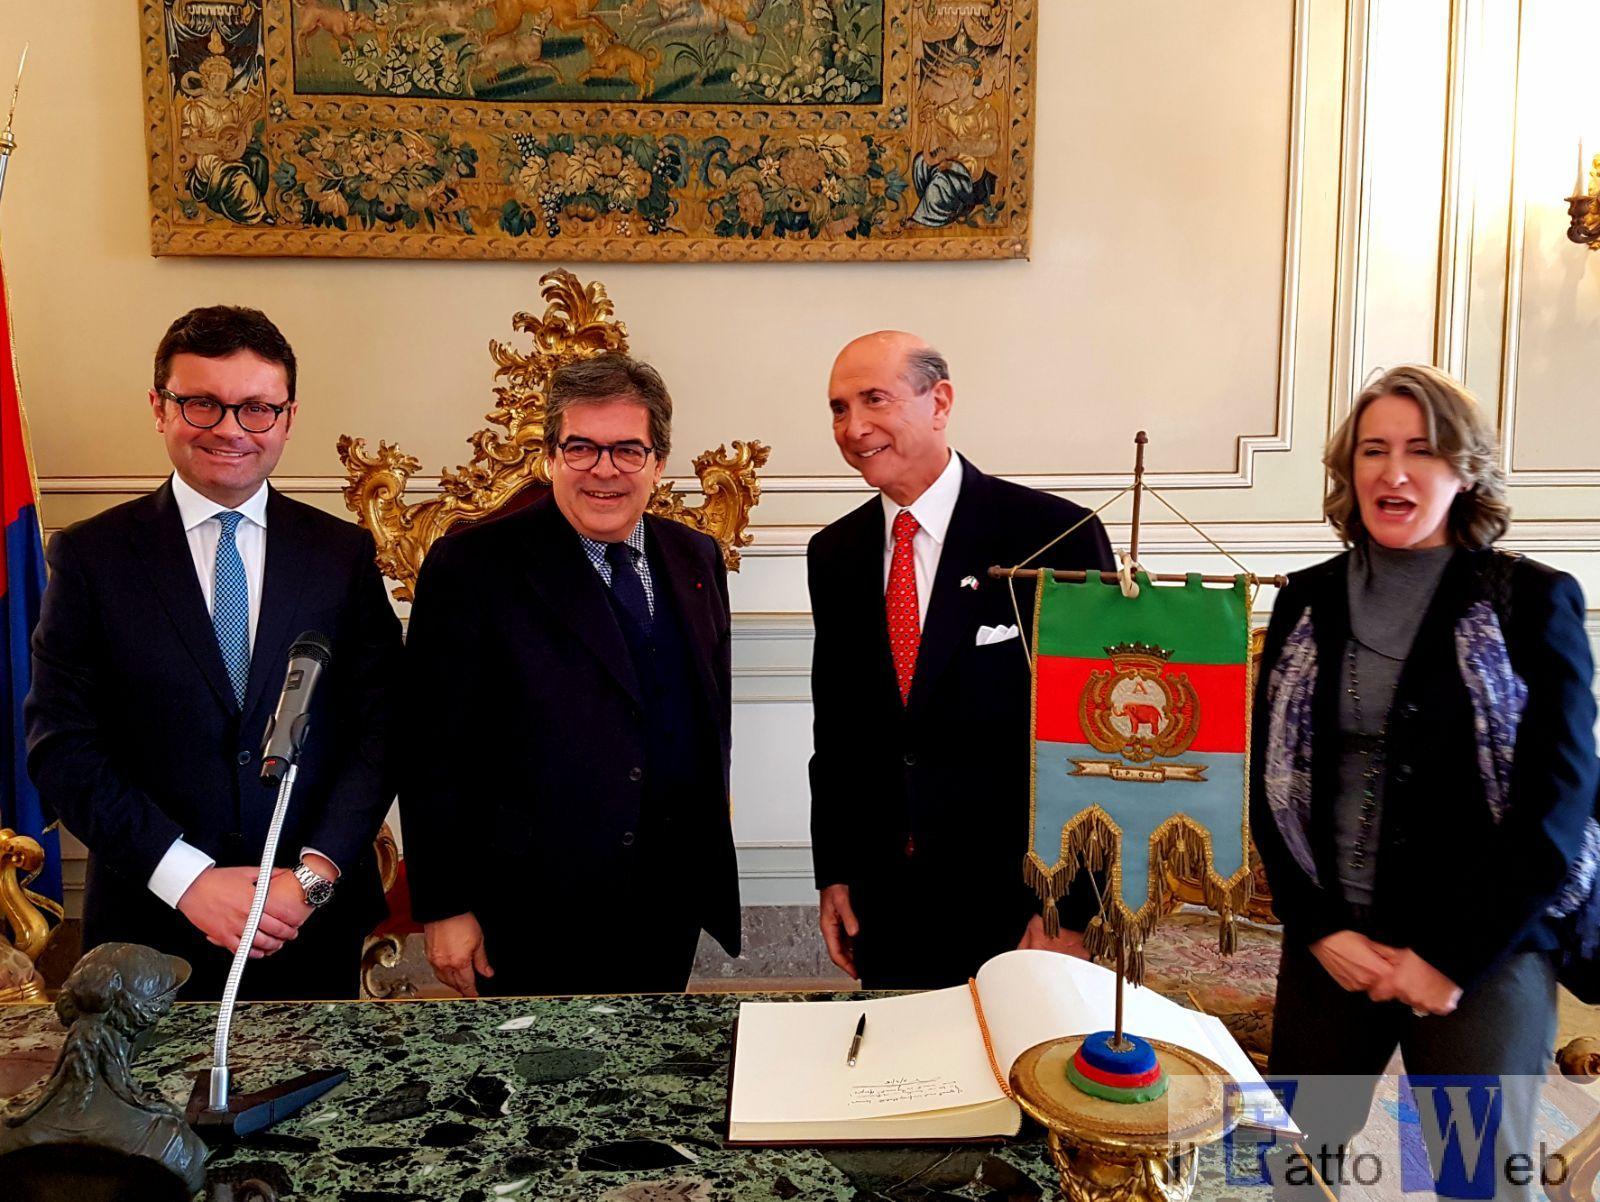 Usa: Bianco incontra ambasciatore Eisenberg